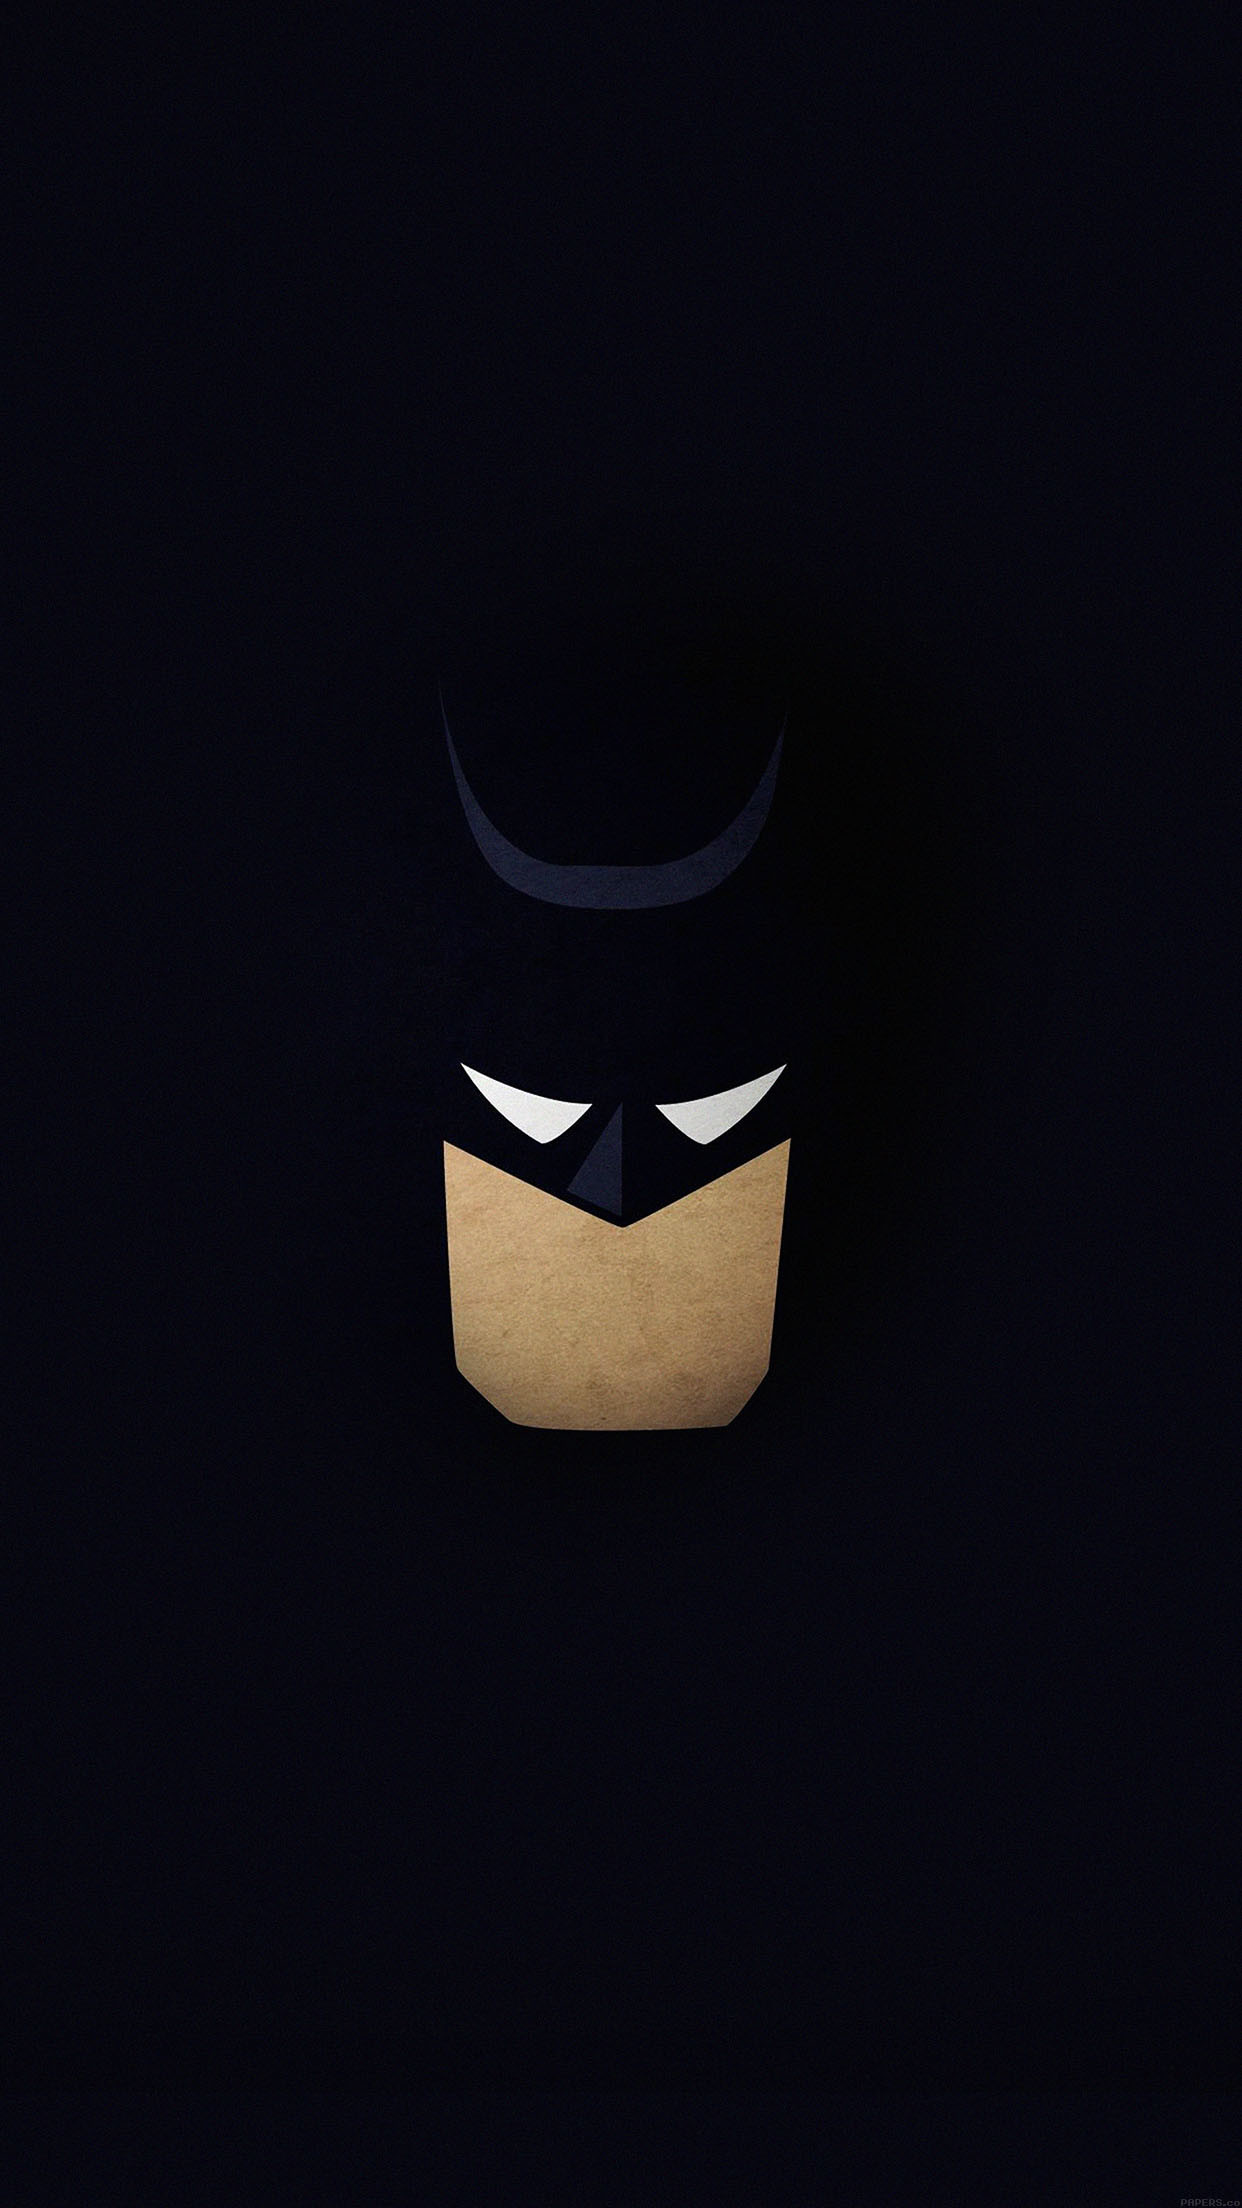 batman logo wallpaper for iphone 6 impremedianet